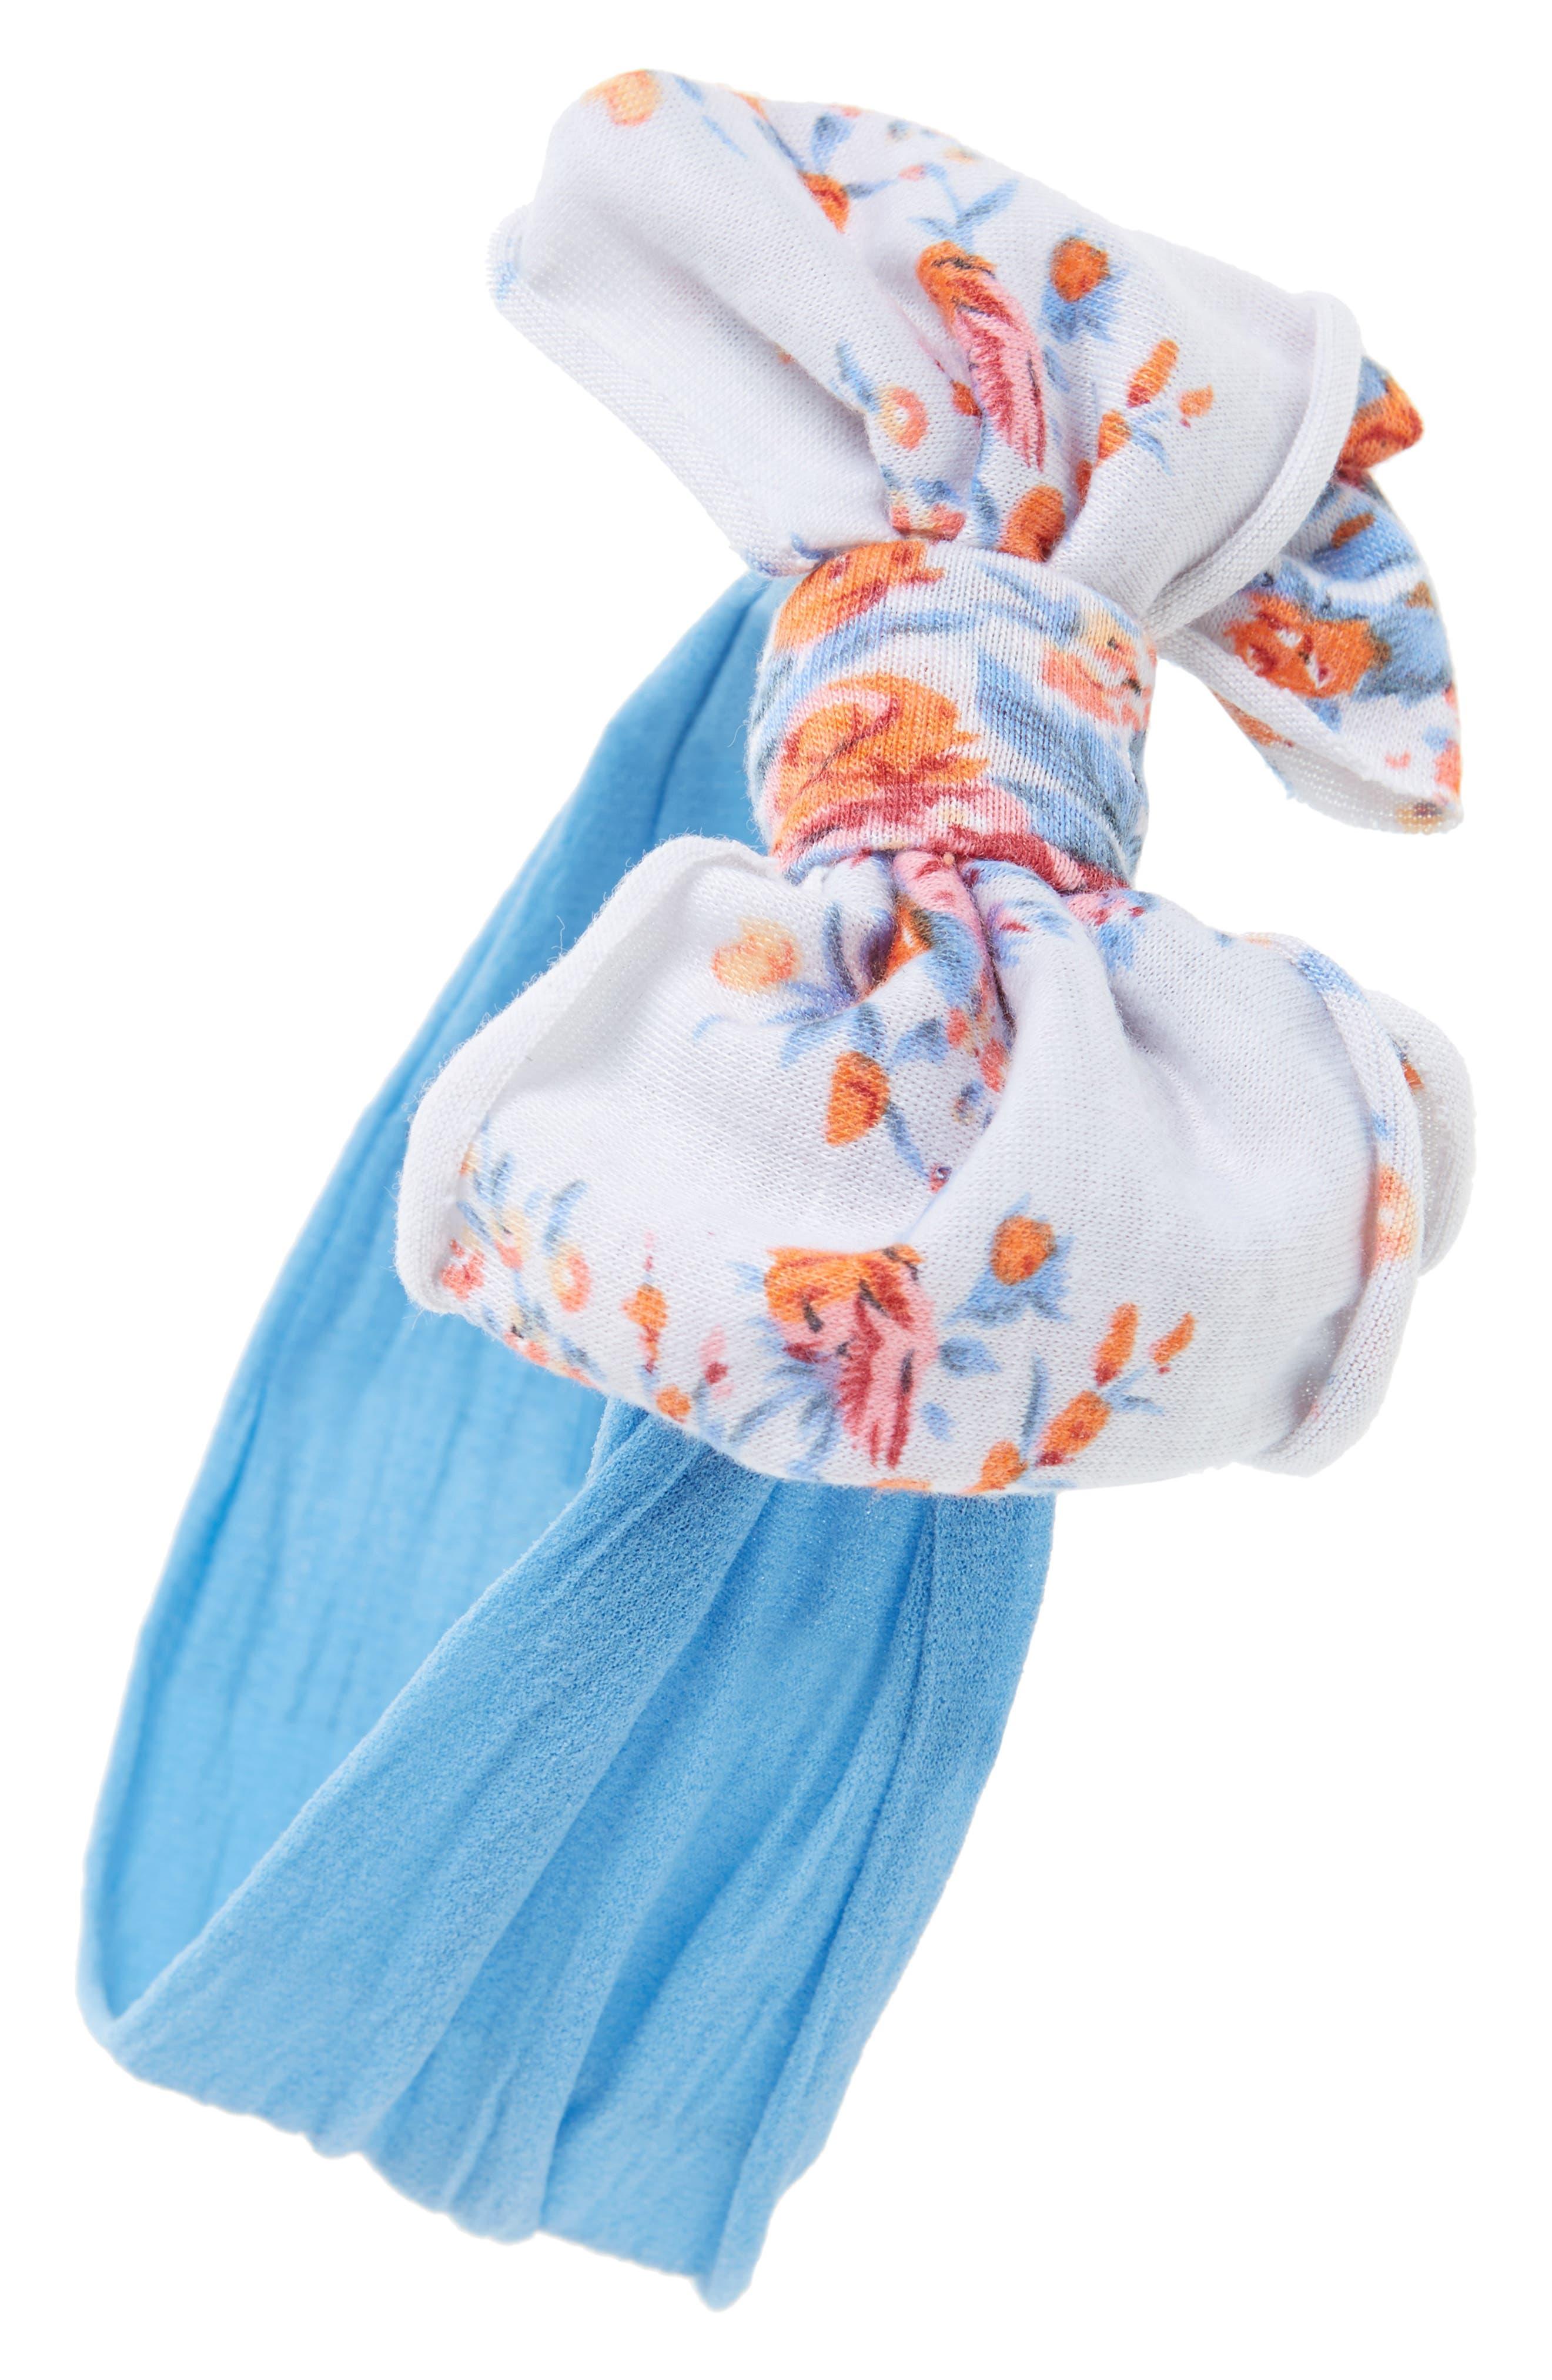 Main Image - Baby Bling Jersey Bow Headband (Baby Girls)